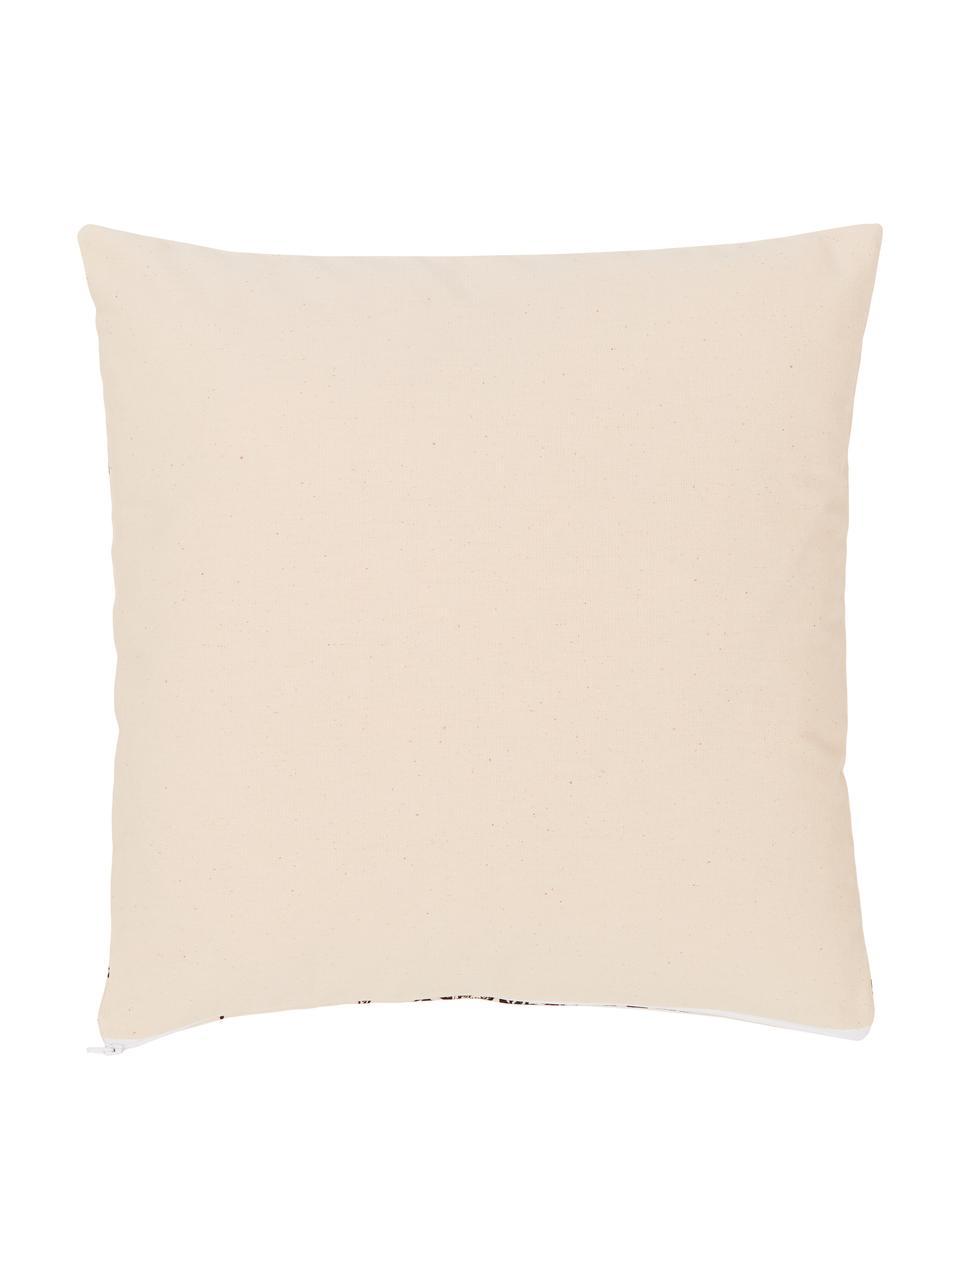 Kissenhülle Animal Toile, 100% Bio-Baumwolle, GOTS zertifiziert, Beige, 45 x 45 cm